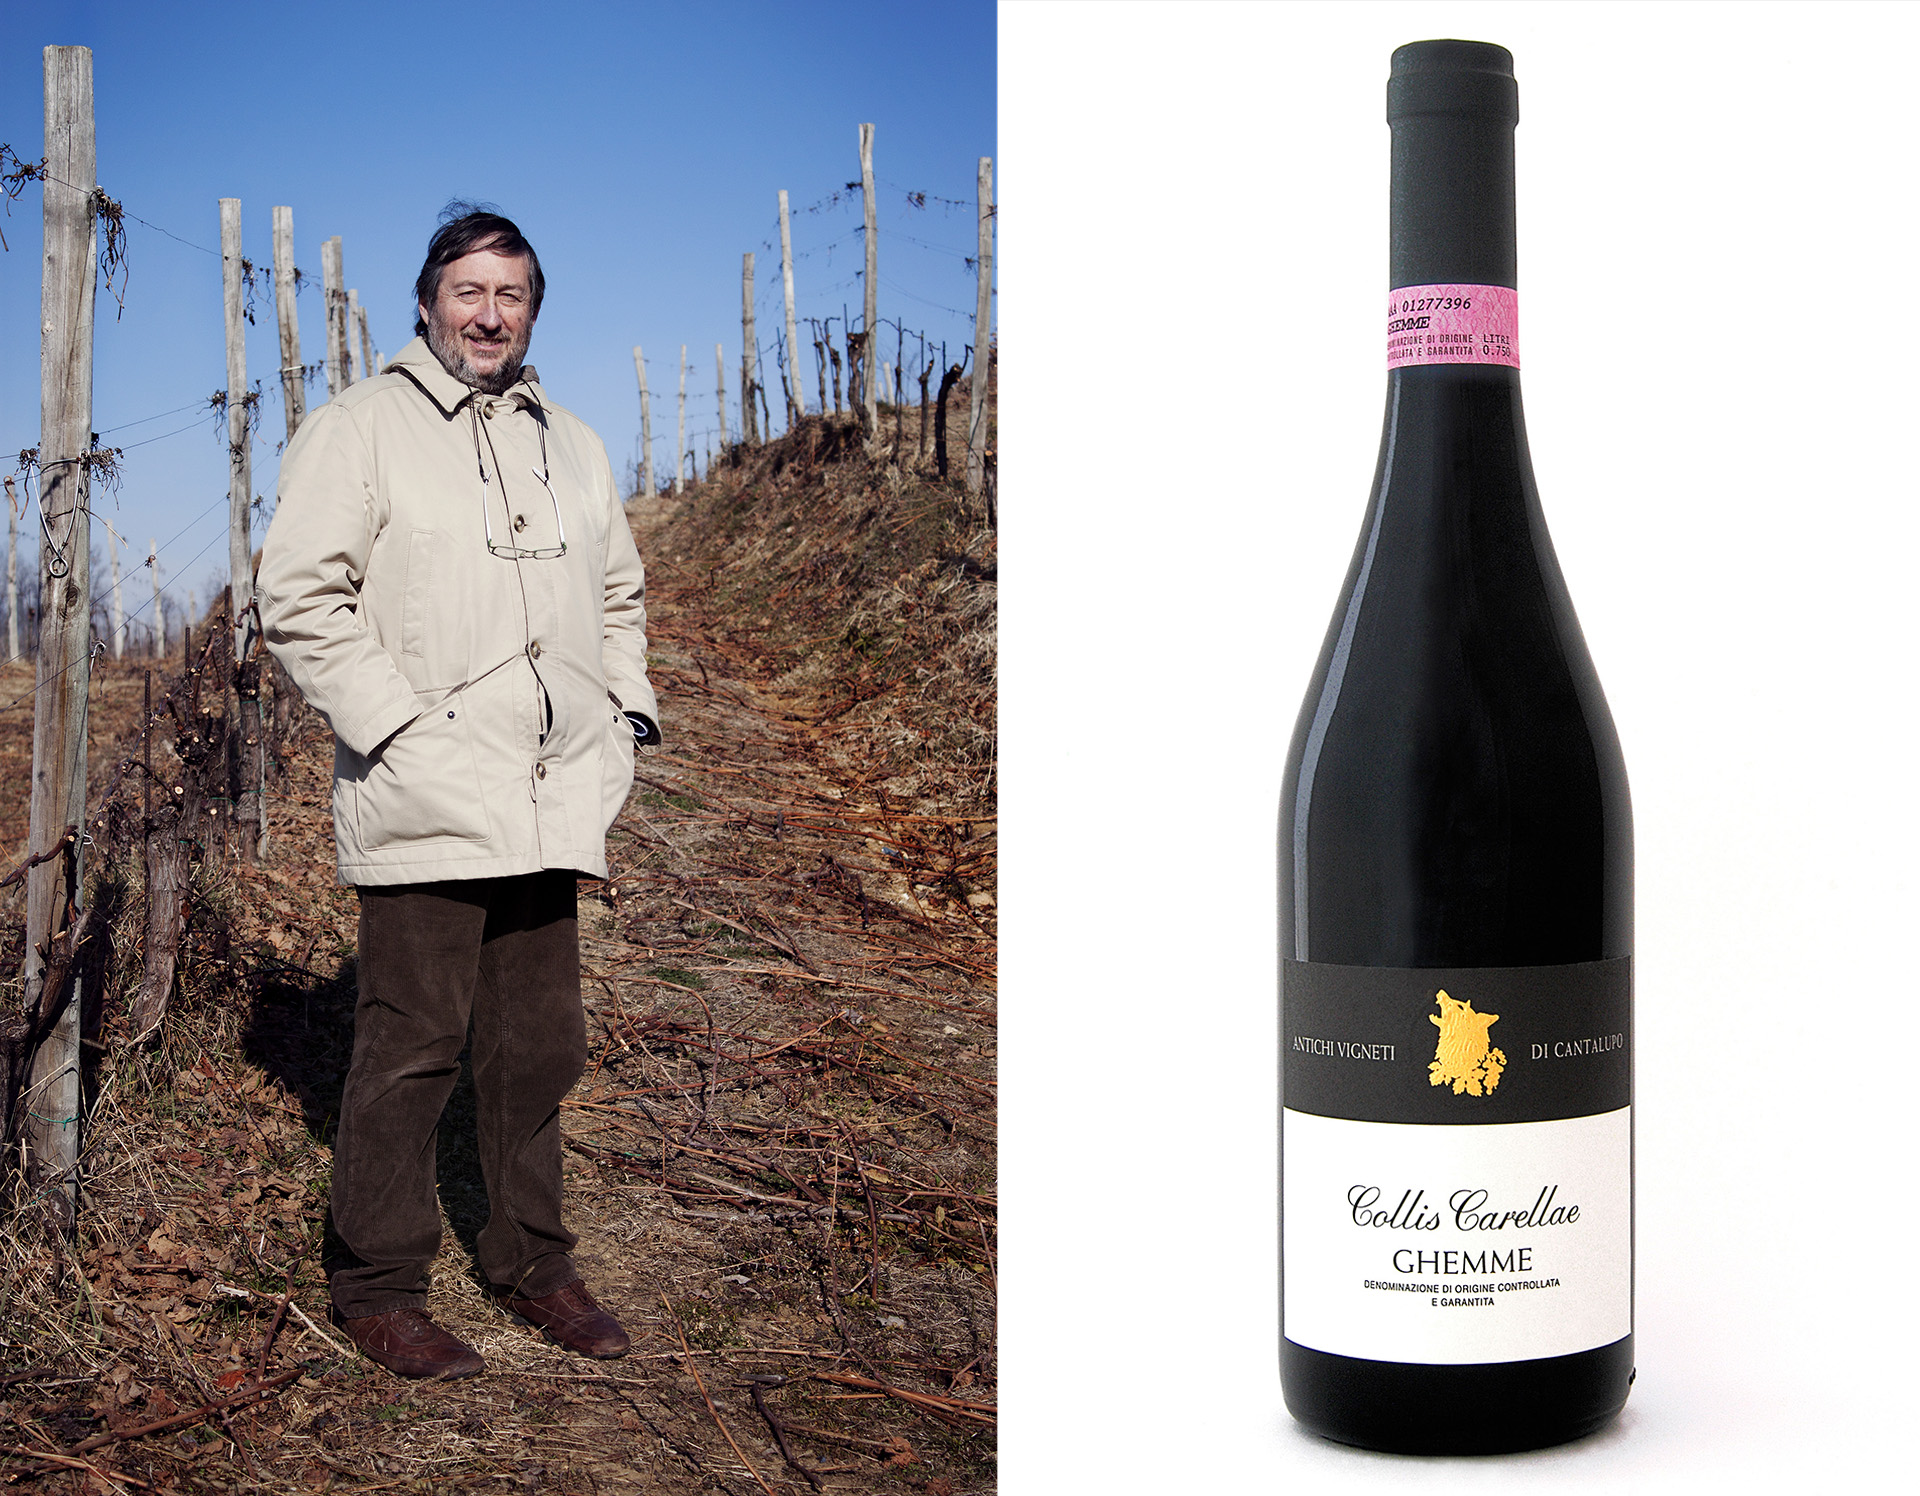 Bygdeoriginalen Alberto Arlunno lager noen av nordlige Piemontes flotteste viner.